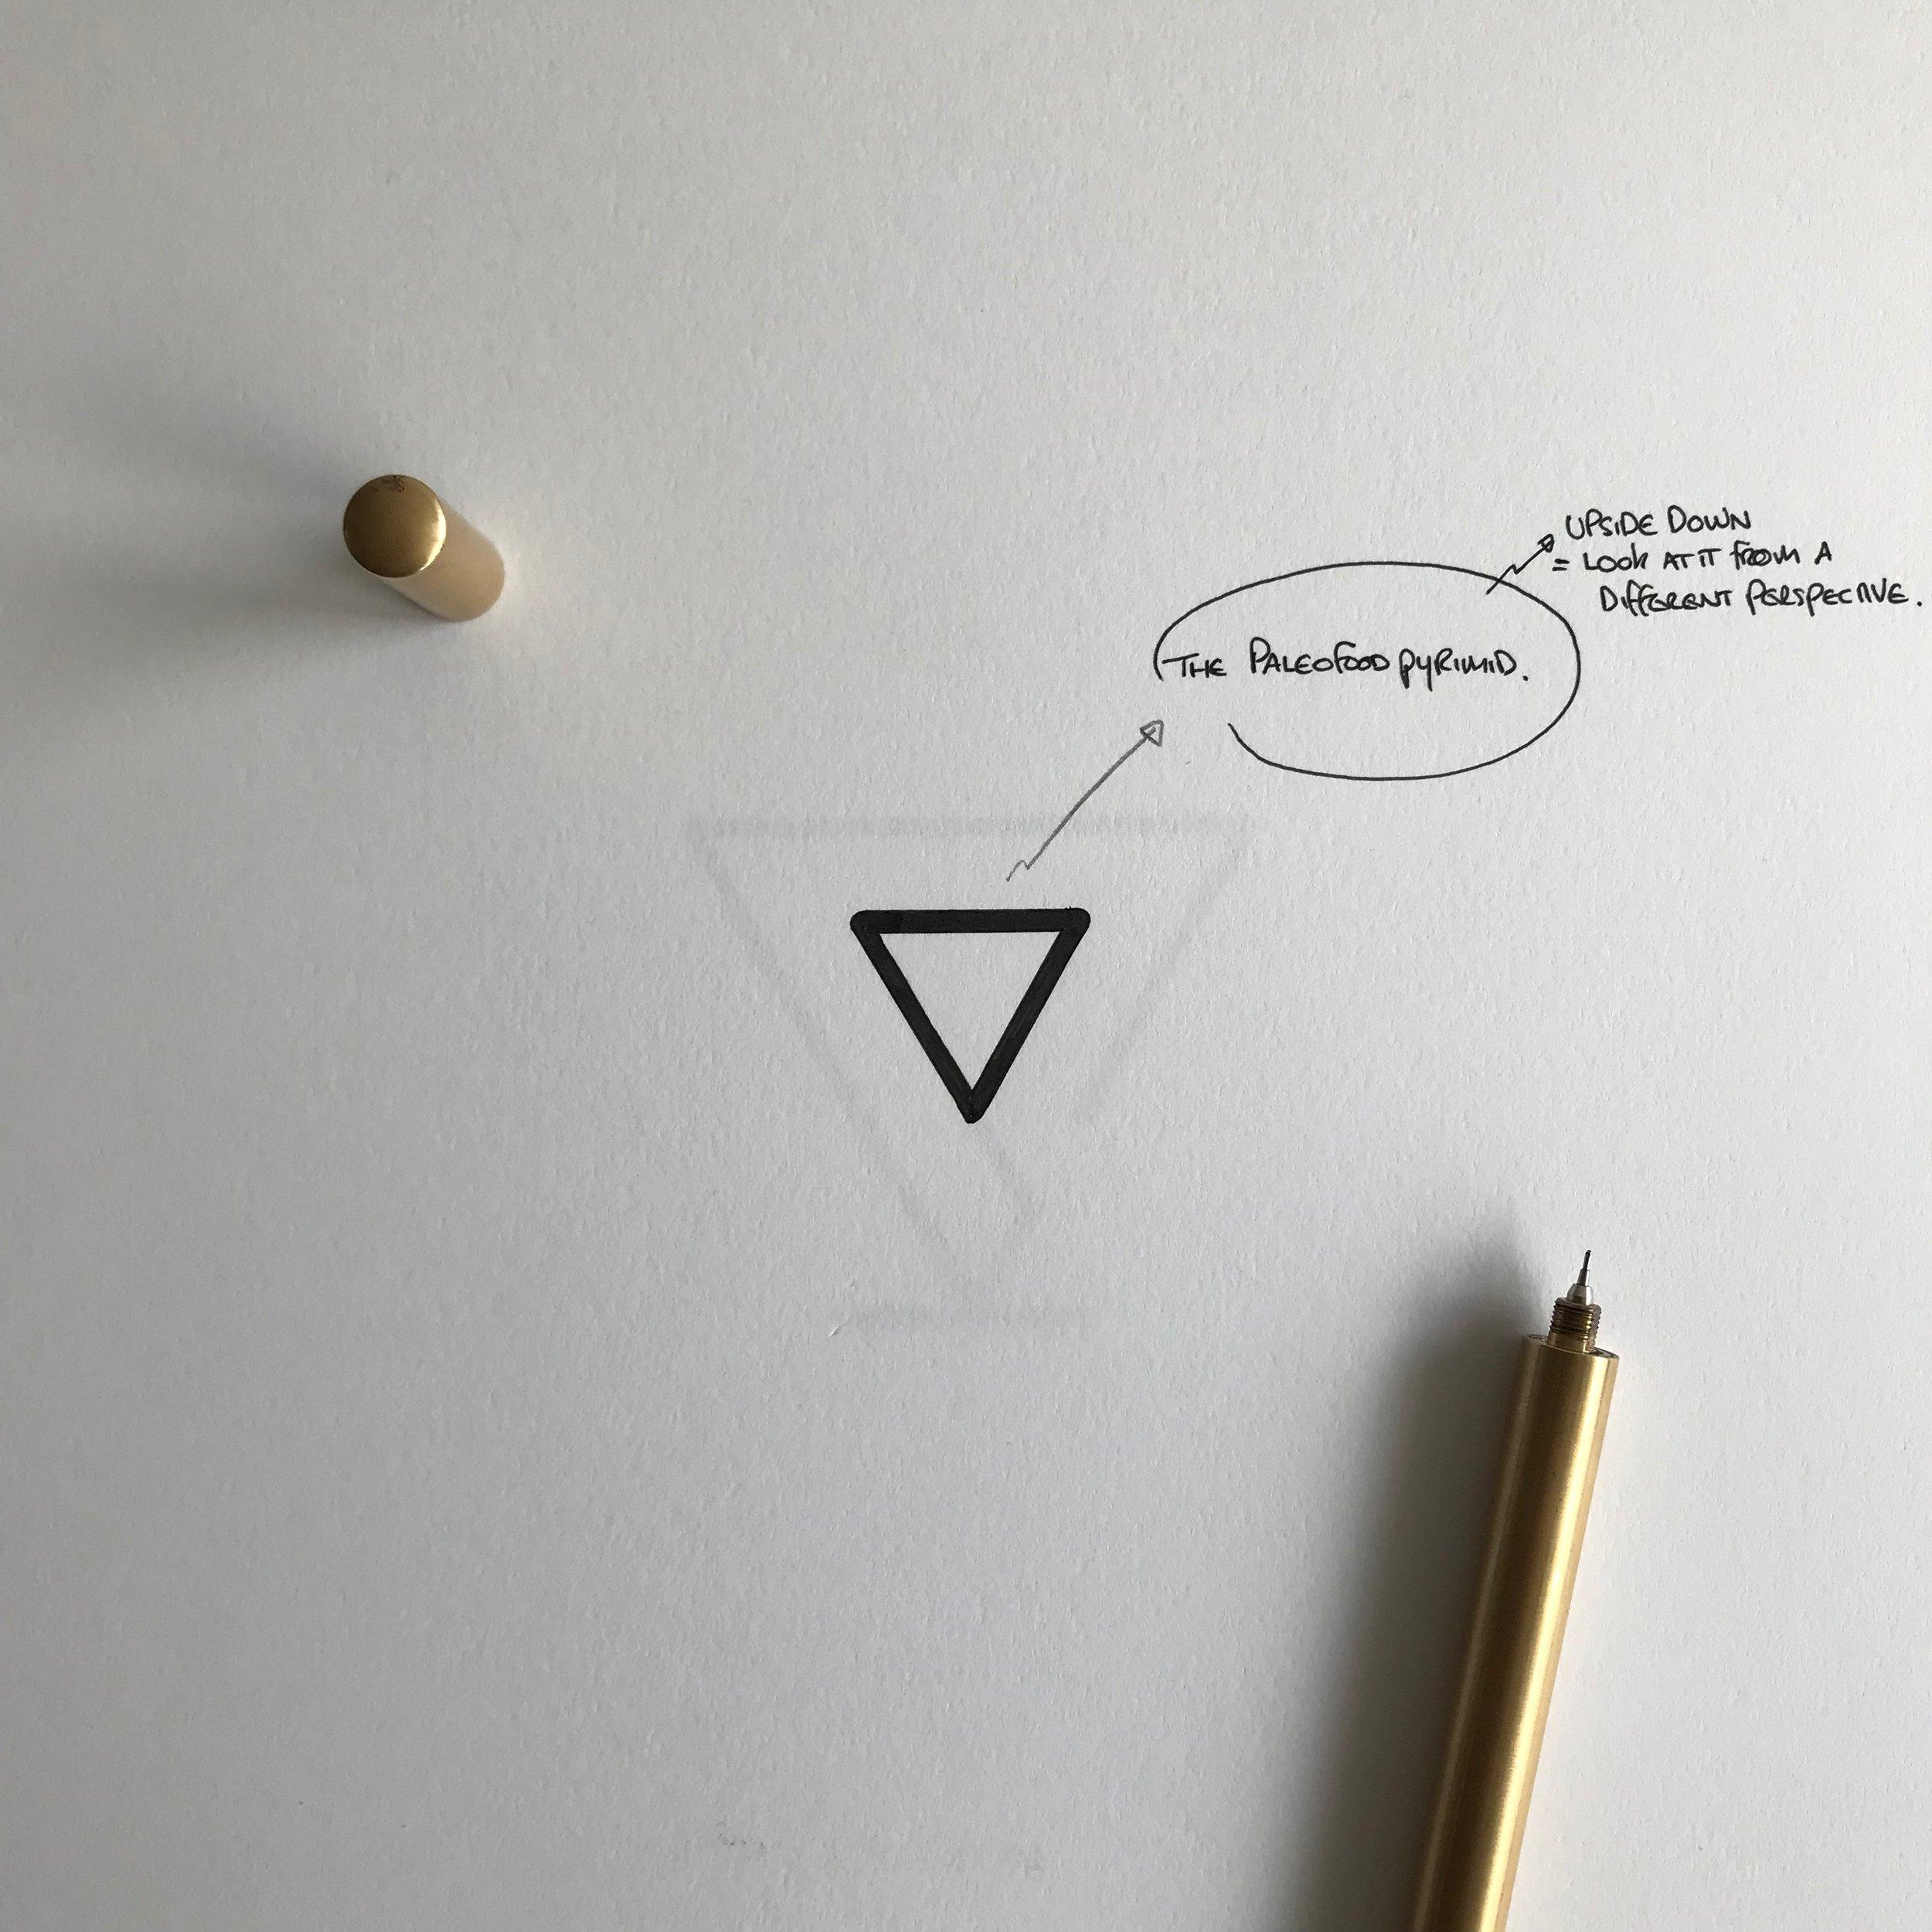 Paleoish-Sketch-1.jpg